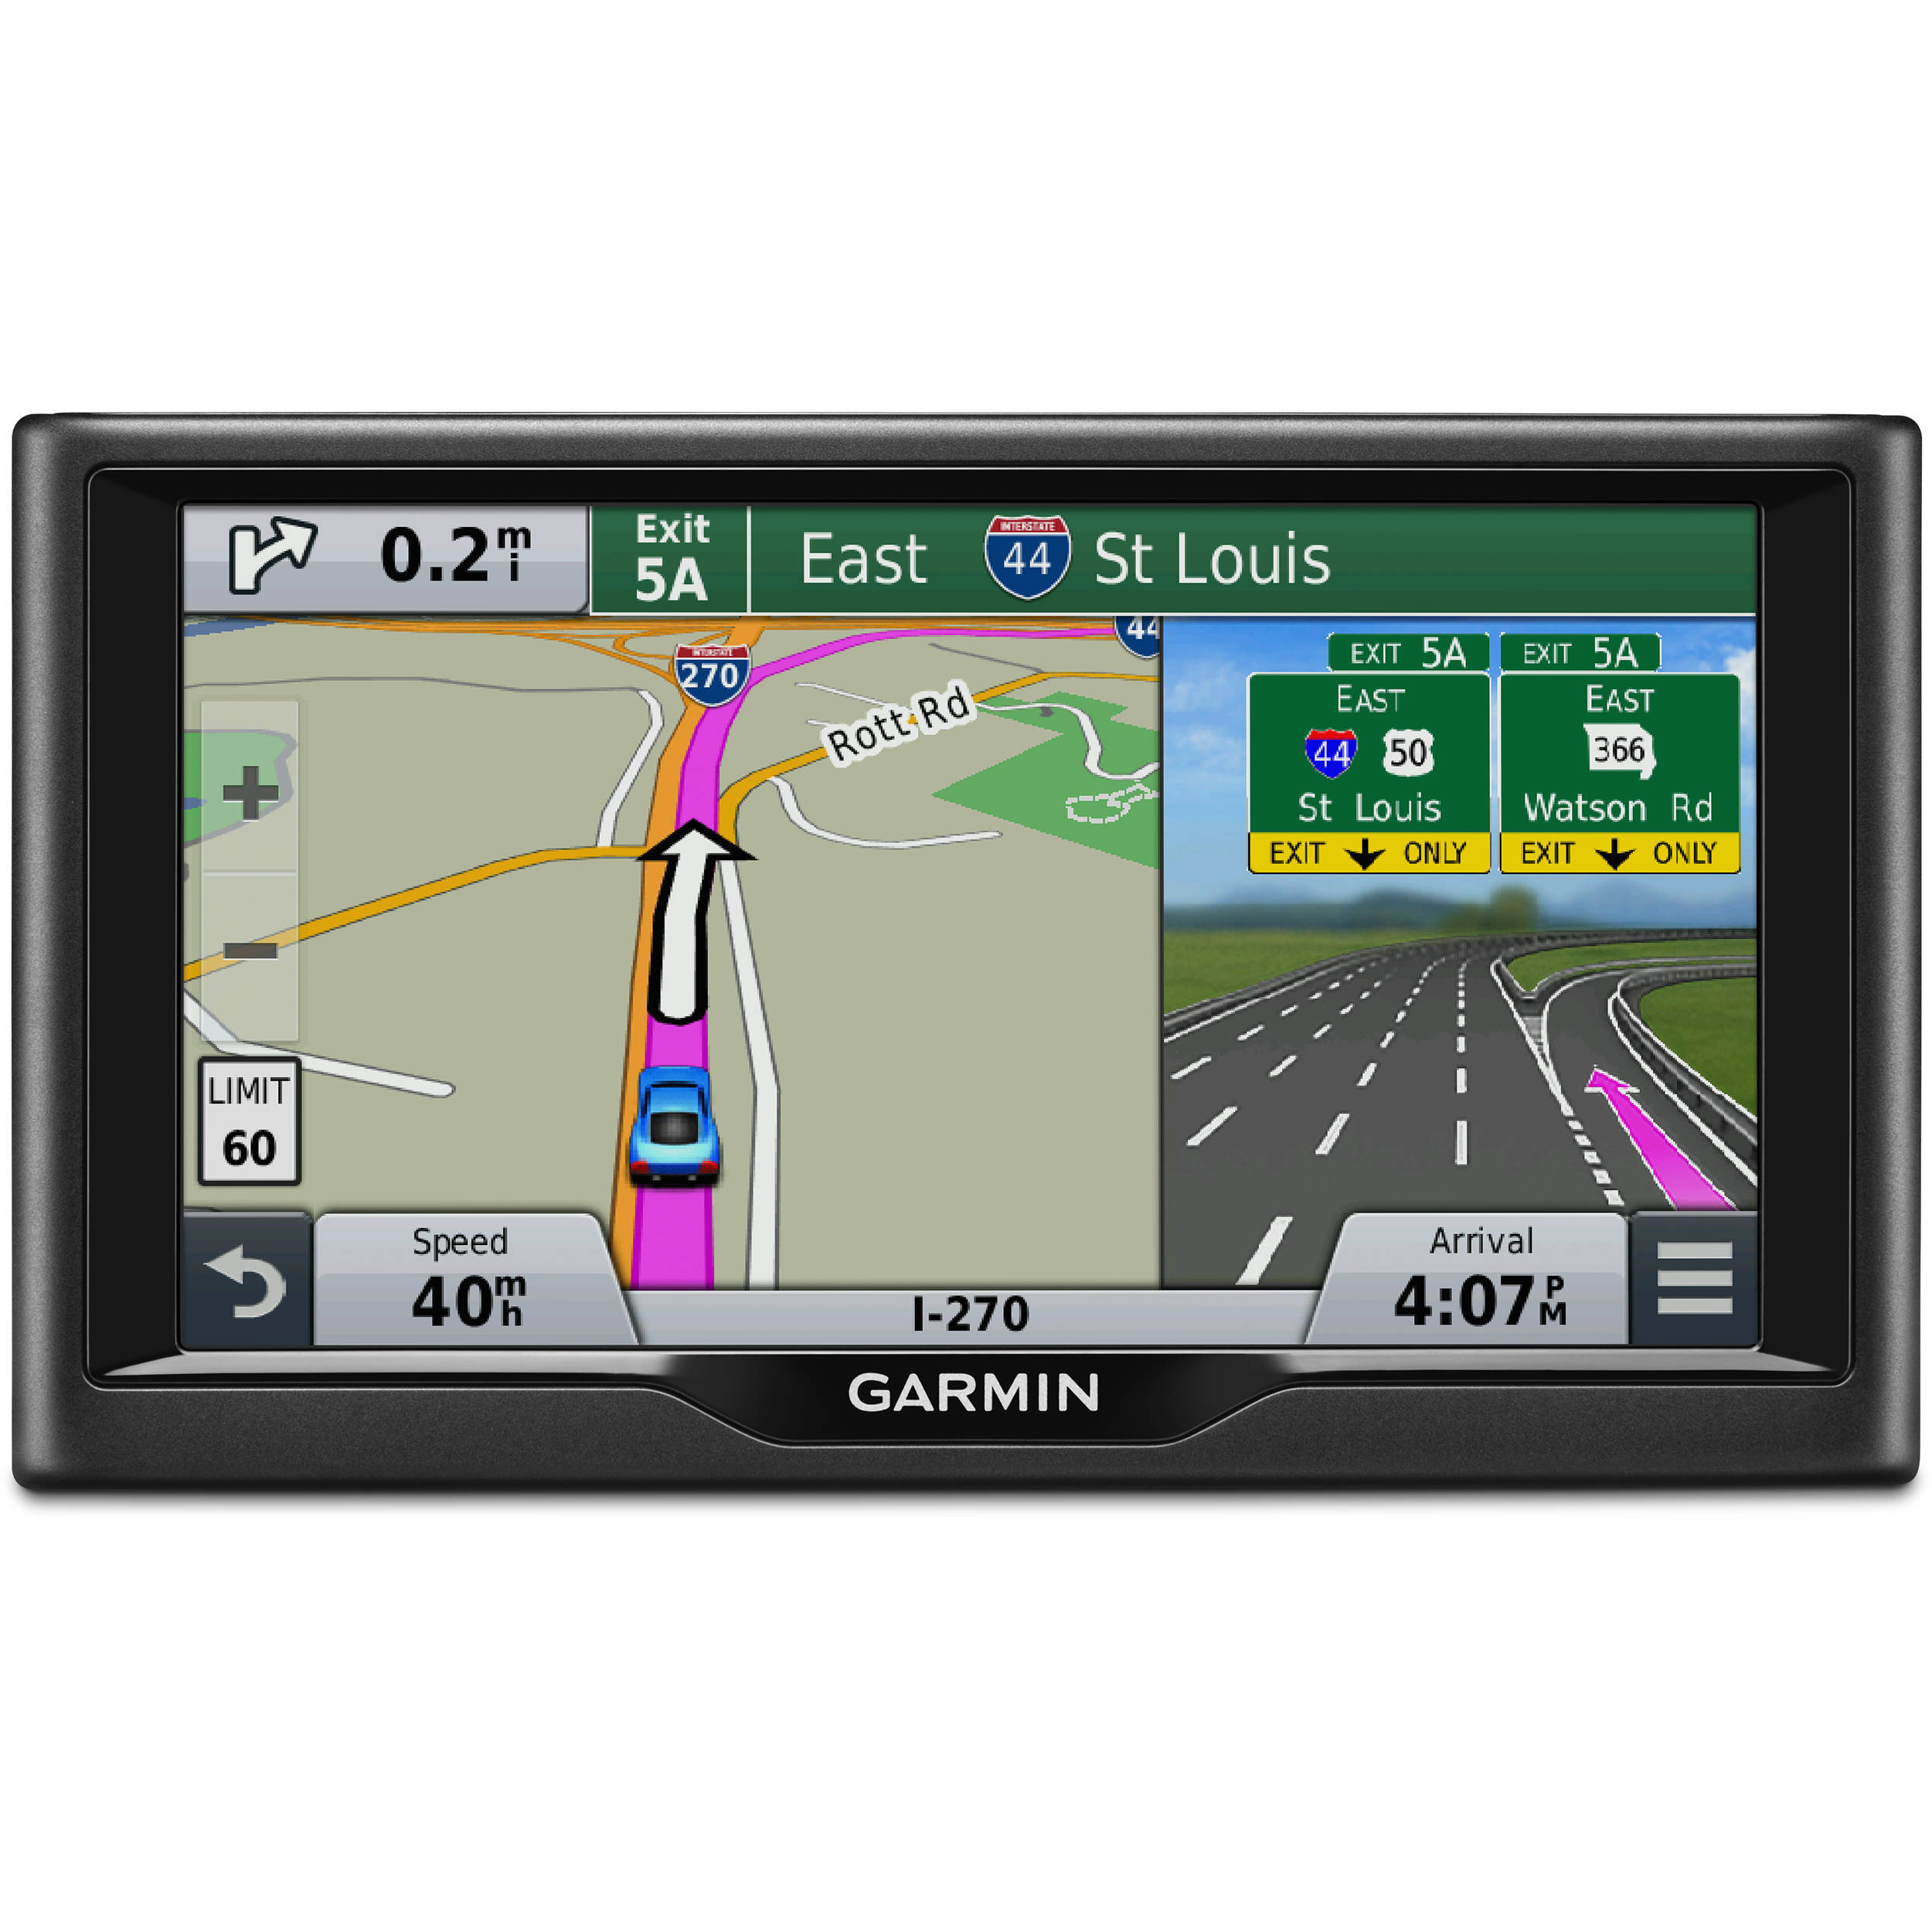 GPS Maps | Road Maps | Garmin